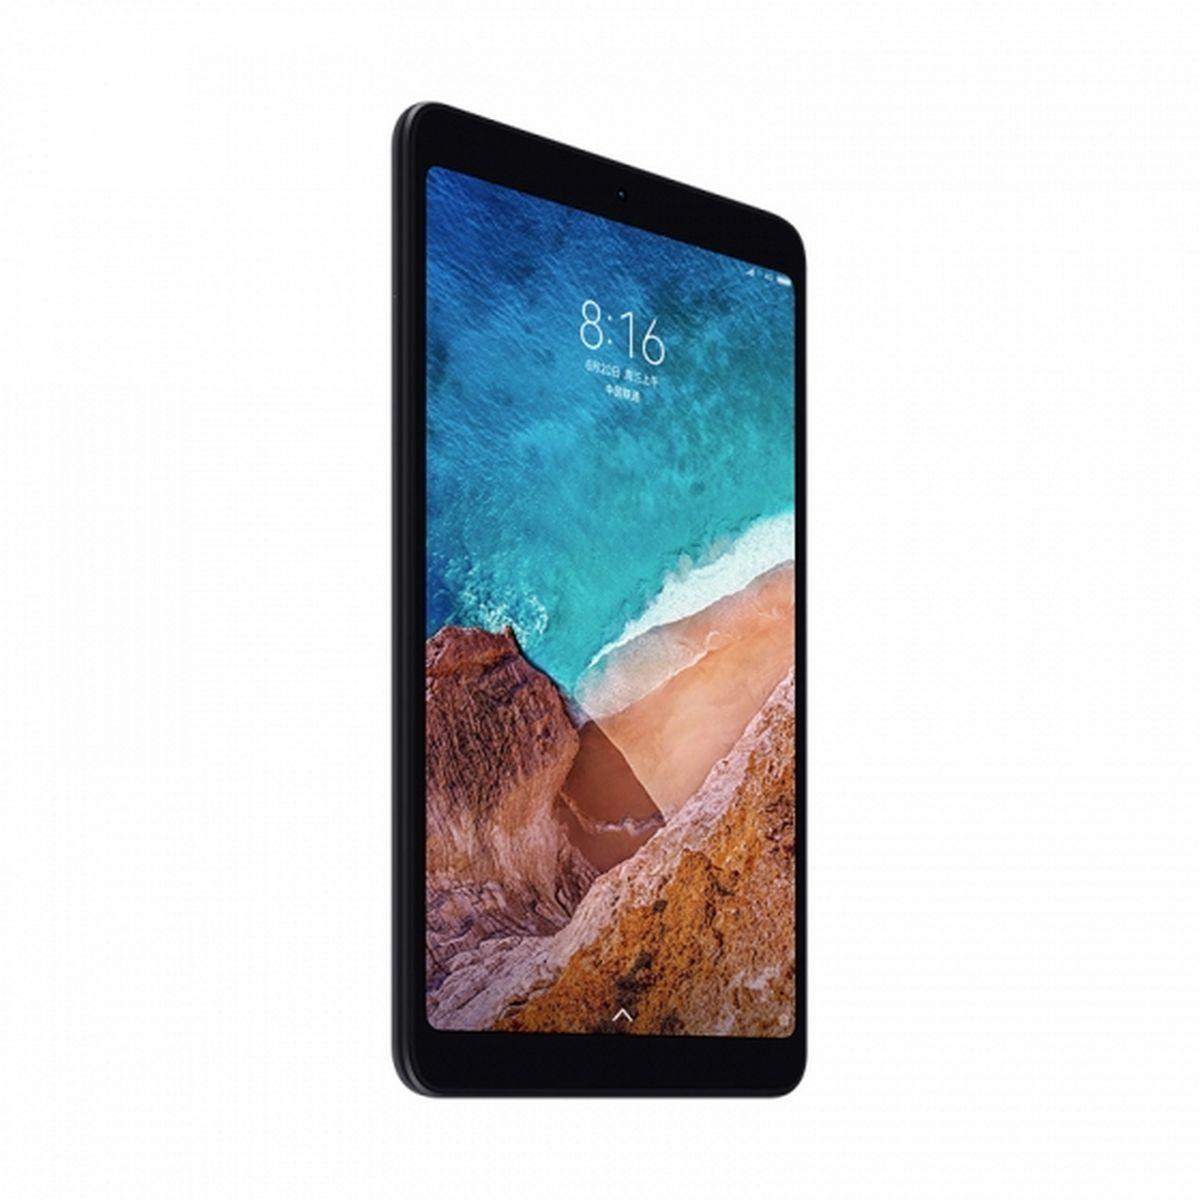 Xiaomi Mi Pad 4 64/4GB - Snapdragon 660 - Android 8.1   International Version